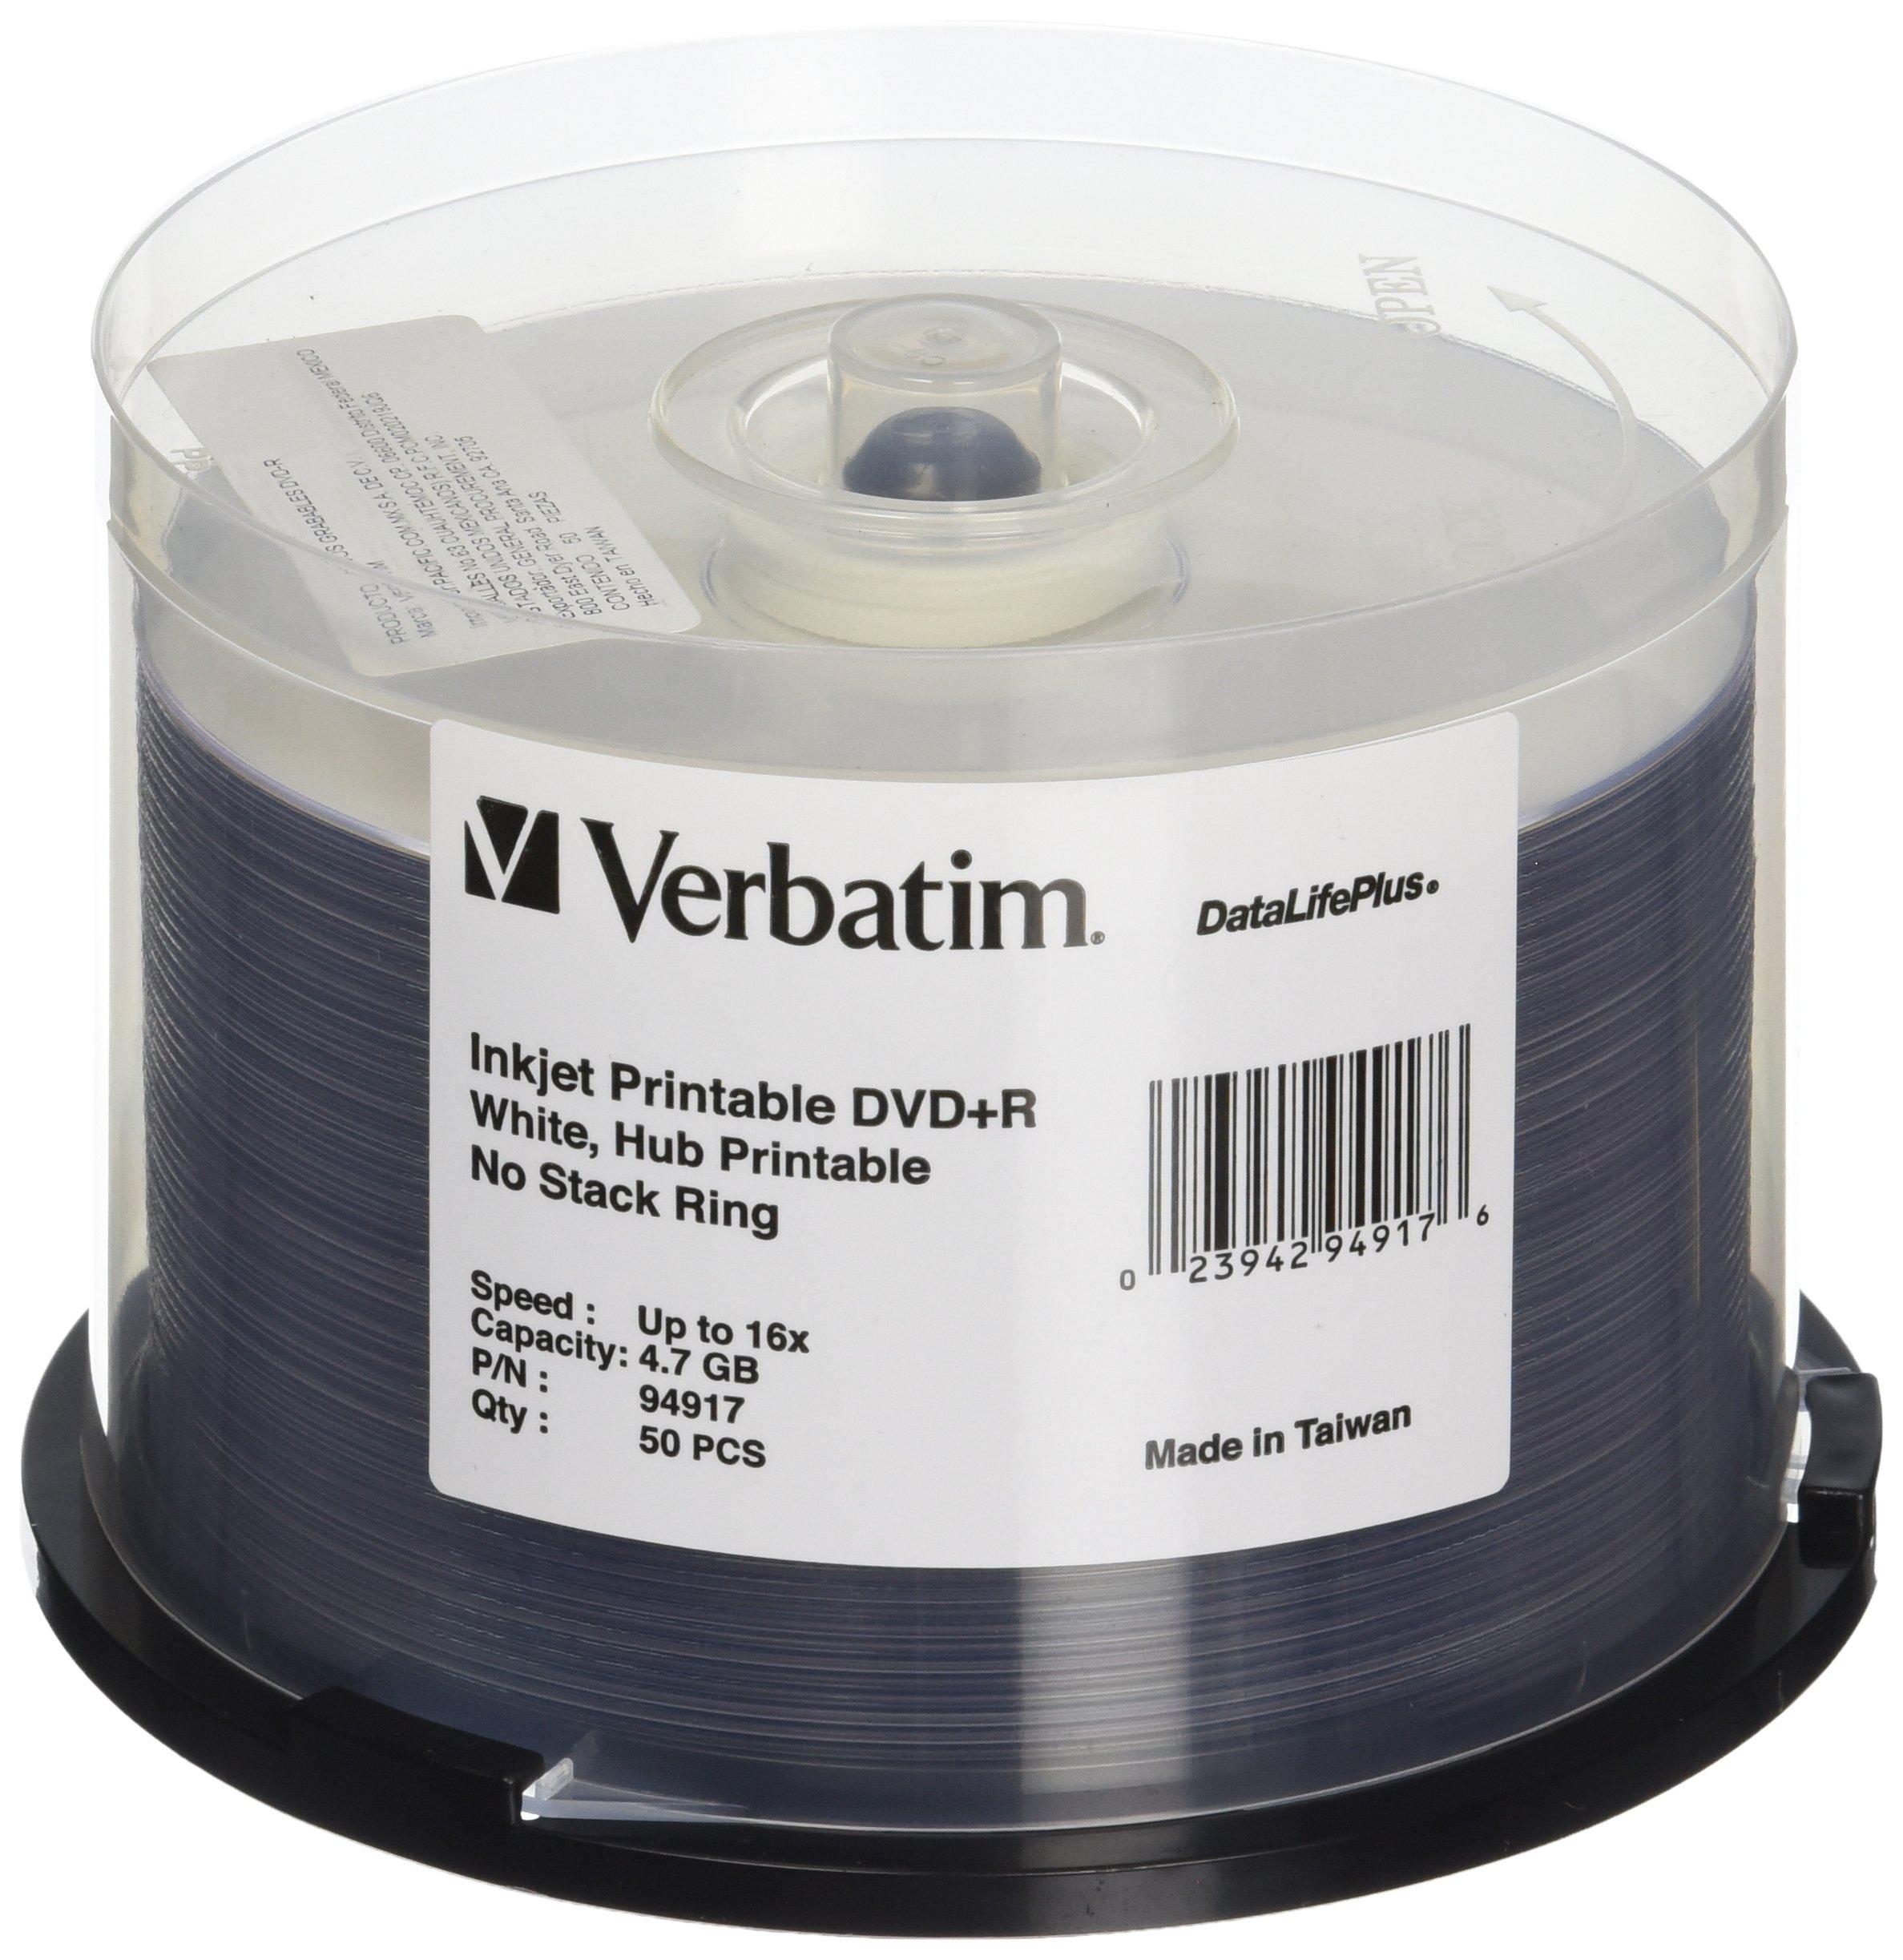 Verbatim DVD+R 4.7GB 16X DataLifePlus White Inkjet Printable, Hub Printable - 50pk Spindle - 94917 by Verbatim